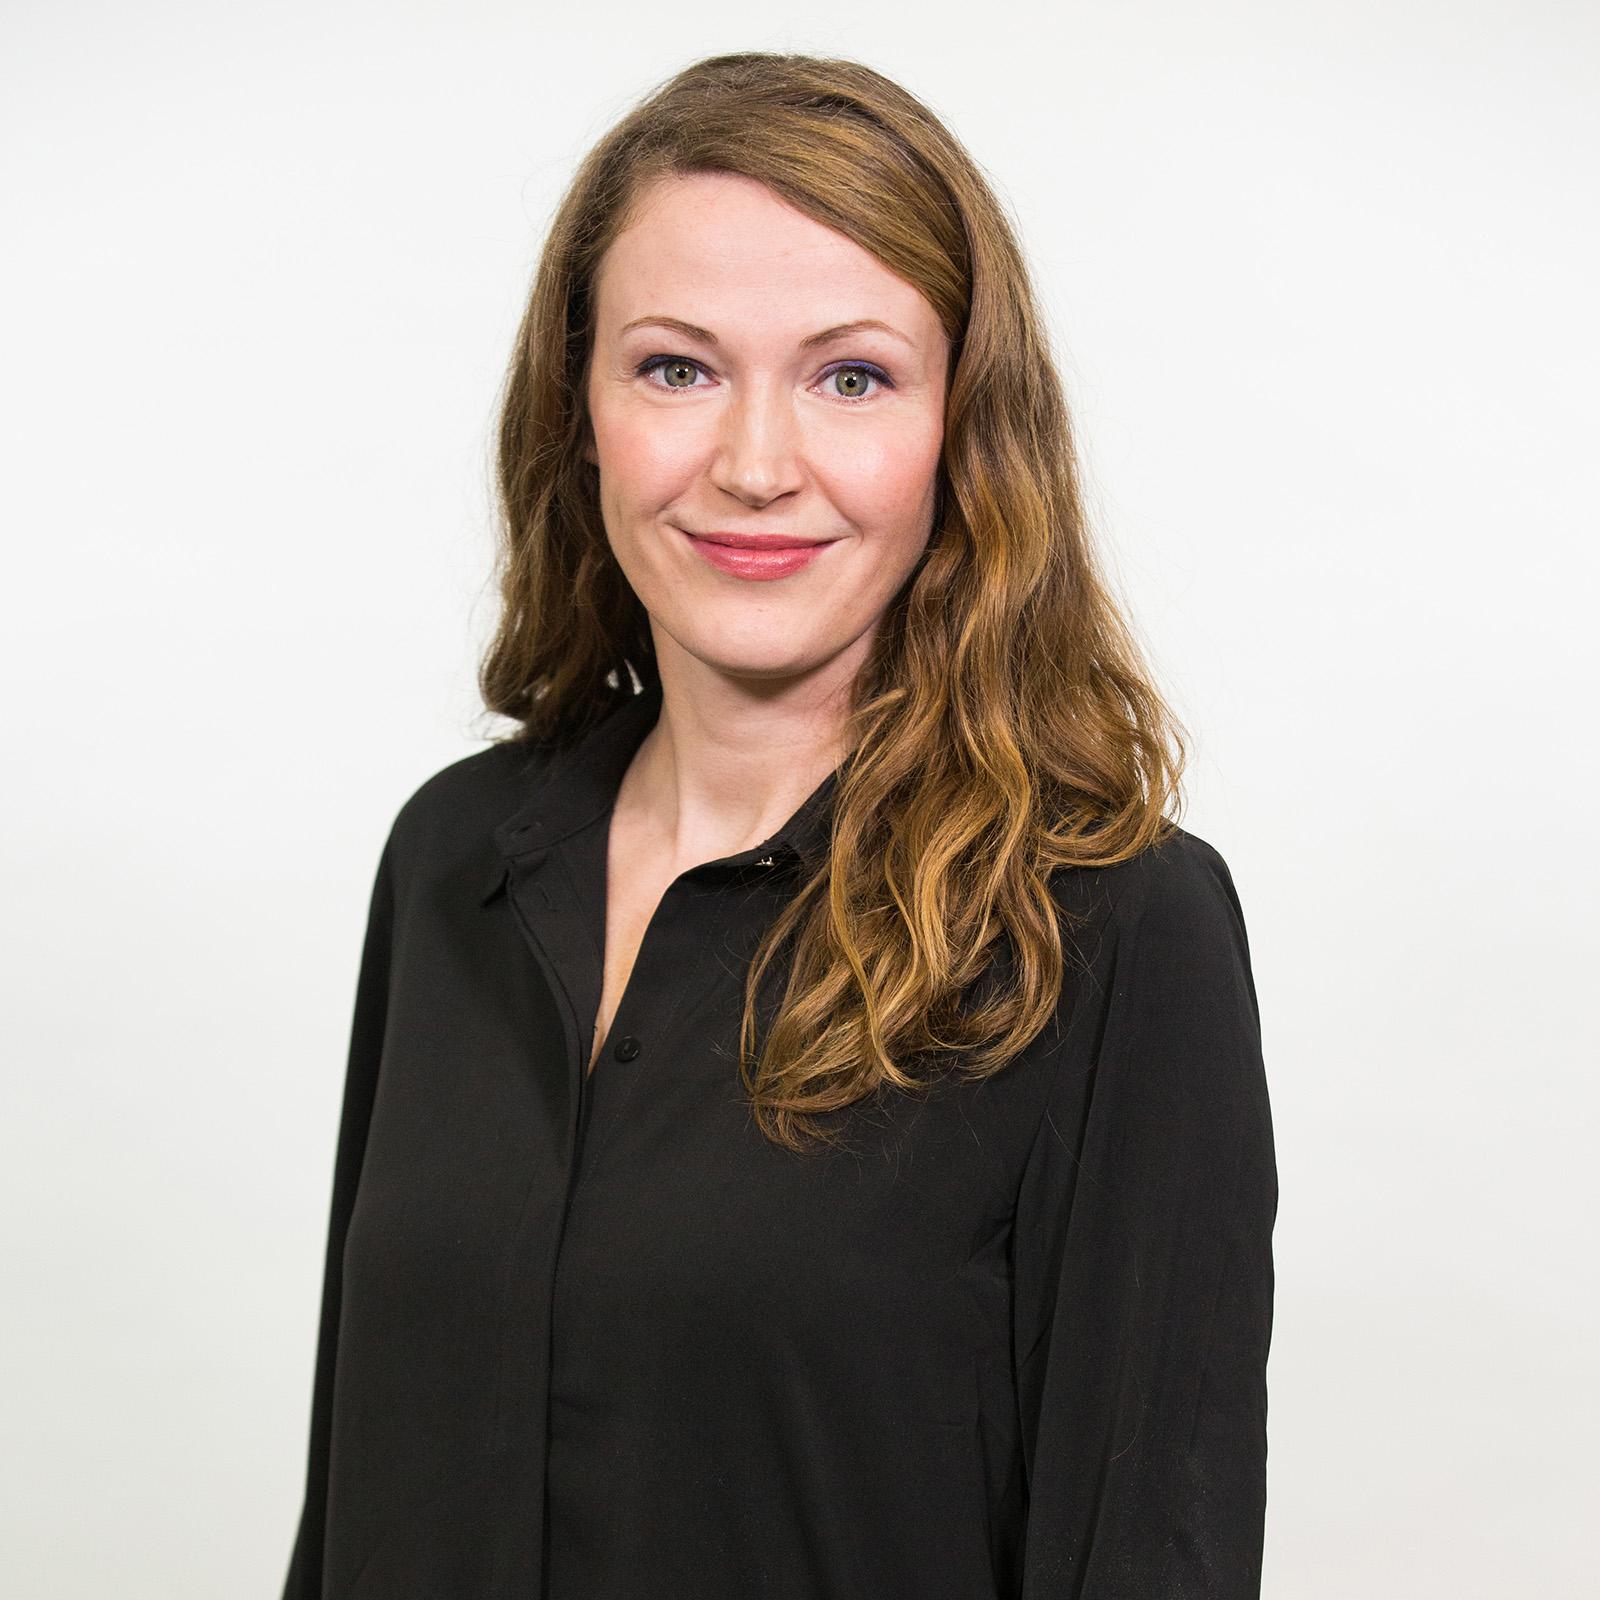 Annika Rudat